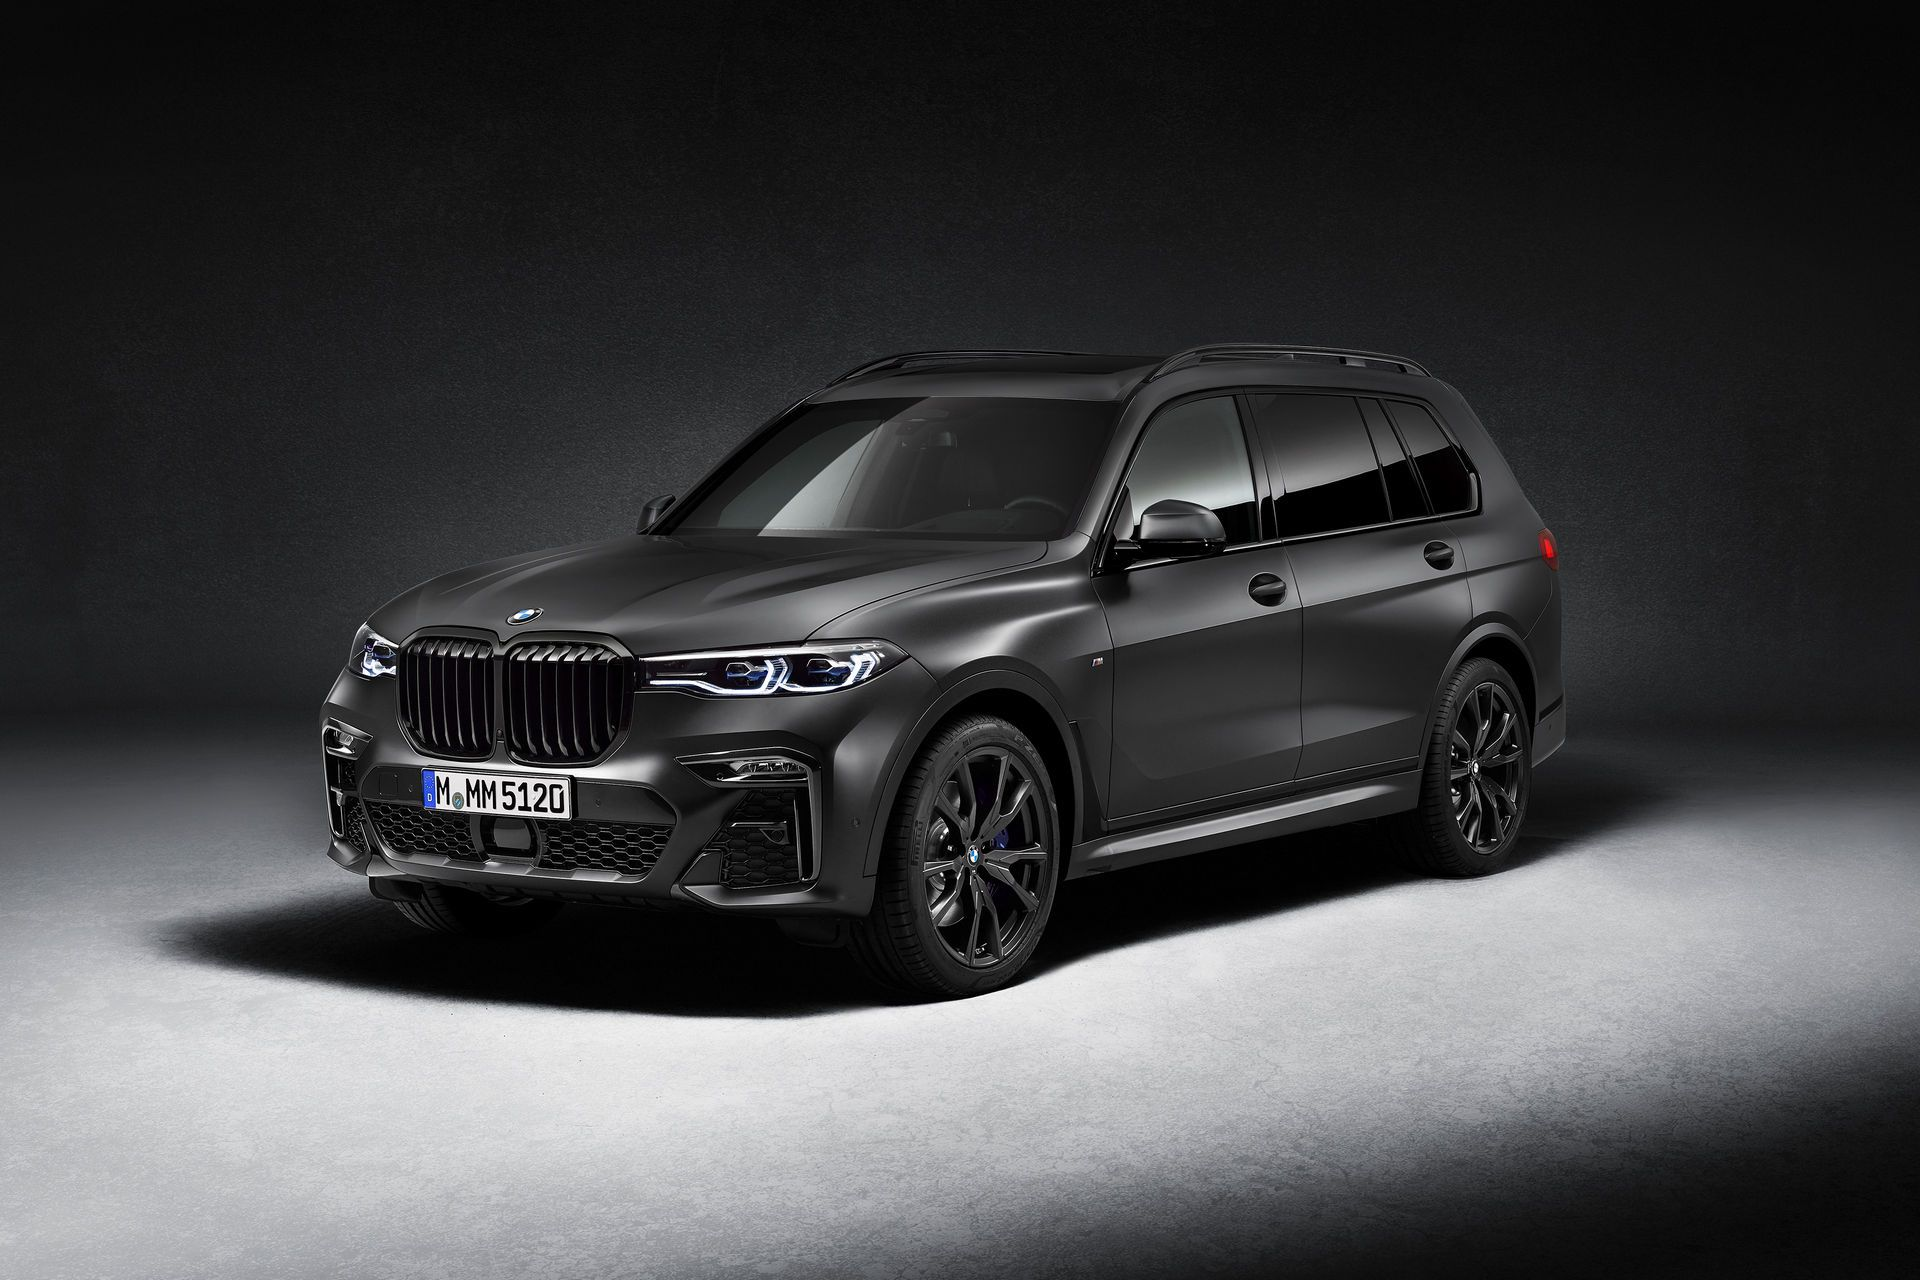 BMW-X7-Dark-Shadow-Edition-2